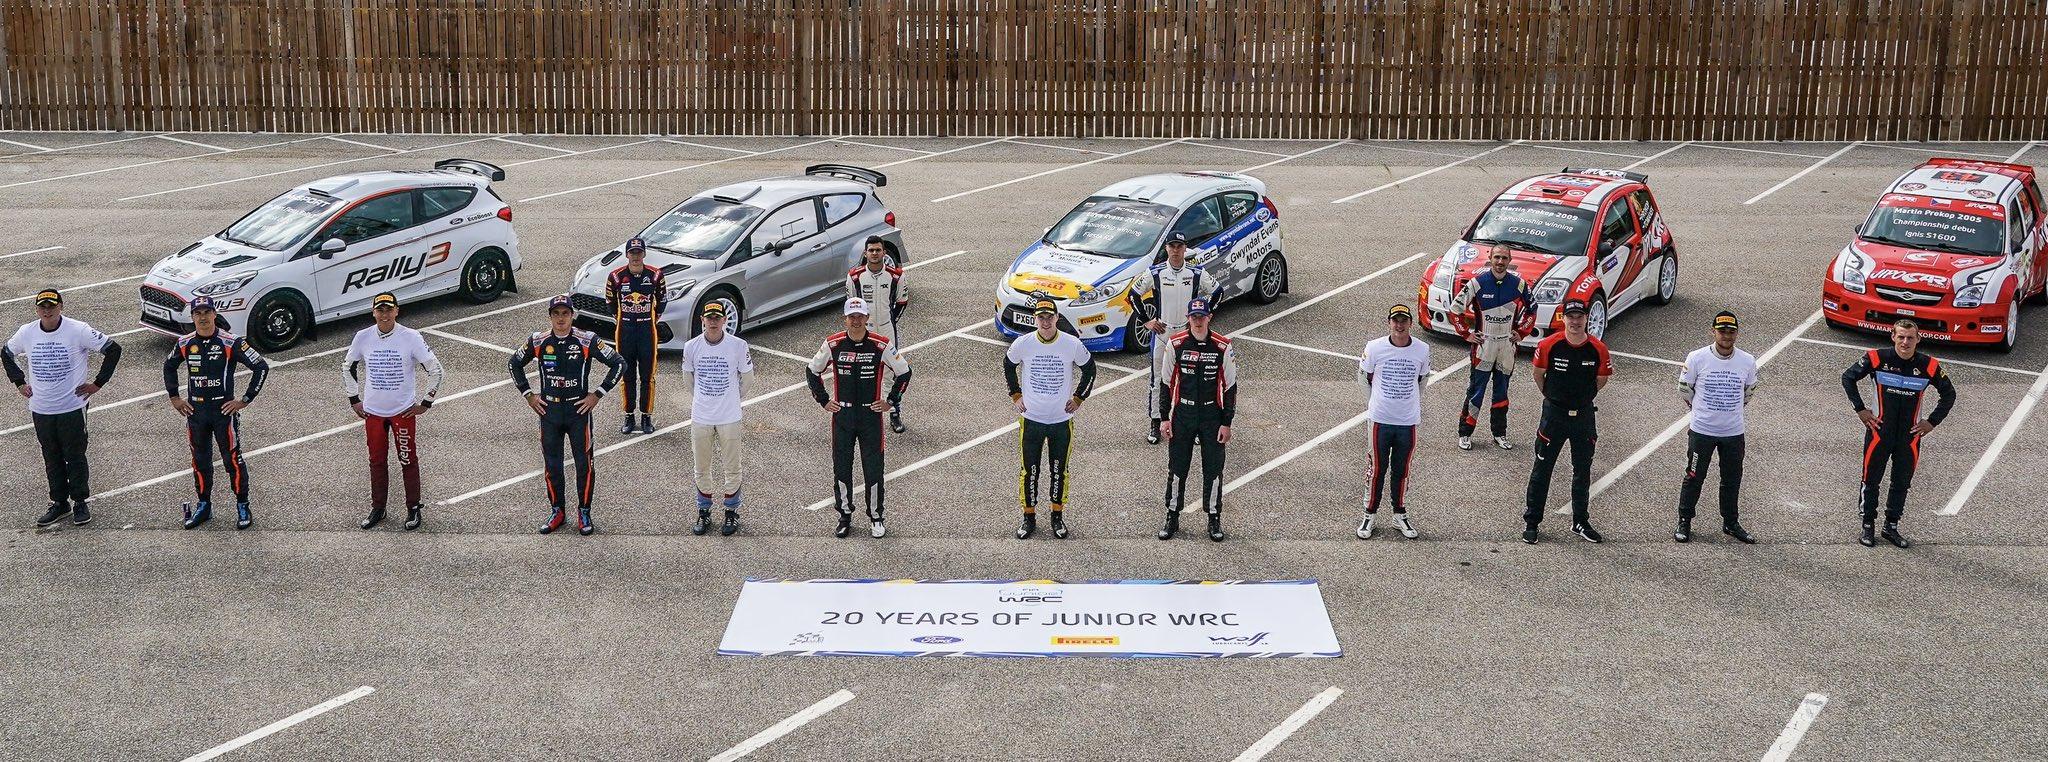 WRC: 56º RallyRACC Catalunya Costa Daurada - Rally de España [14-17 Octubre] - Página 3 FBqbhaoUYAwJ0Oo?format=jpg&name=large